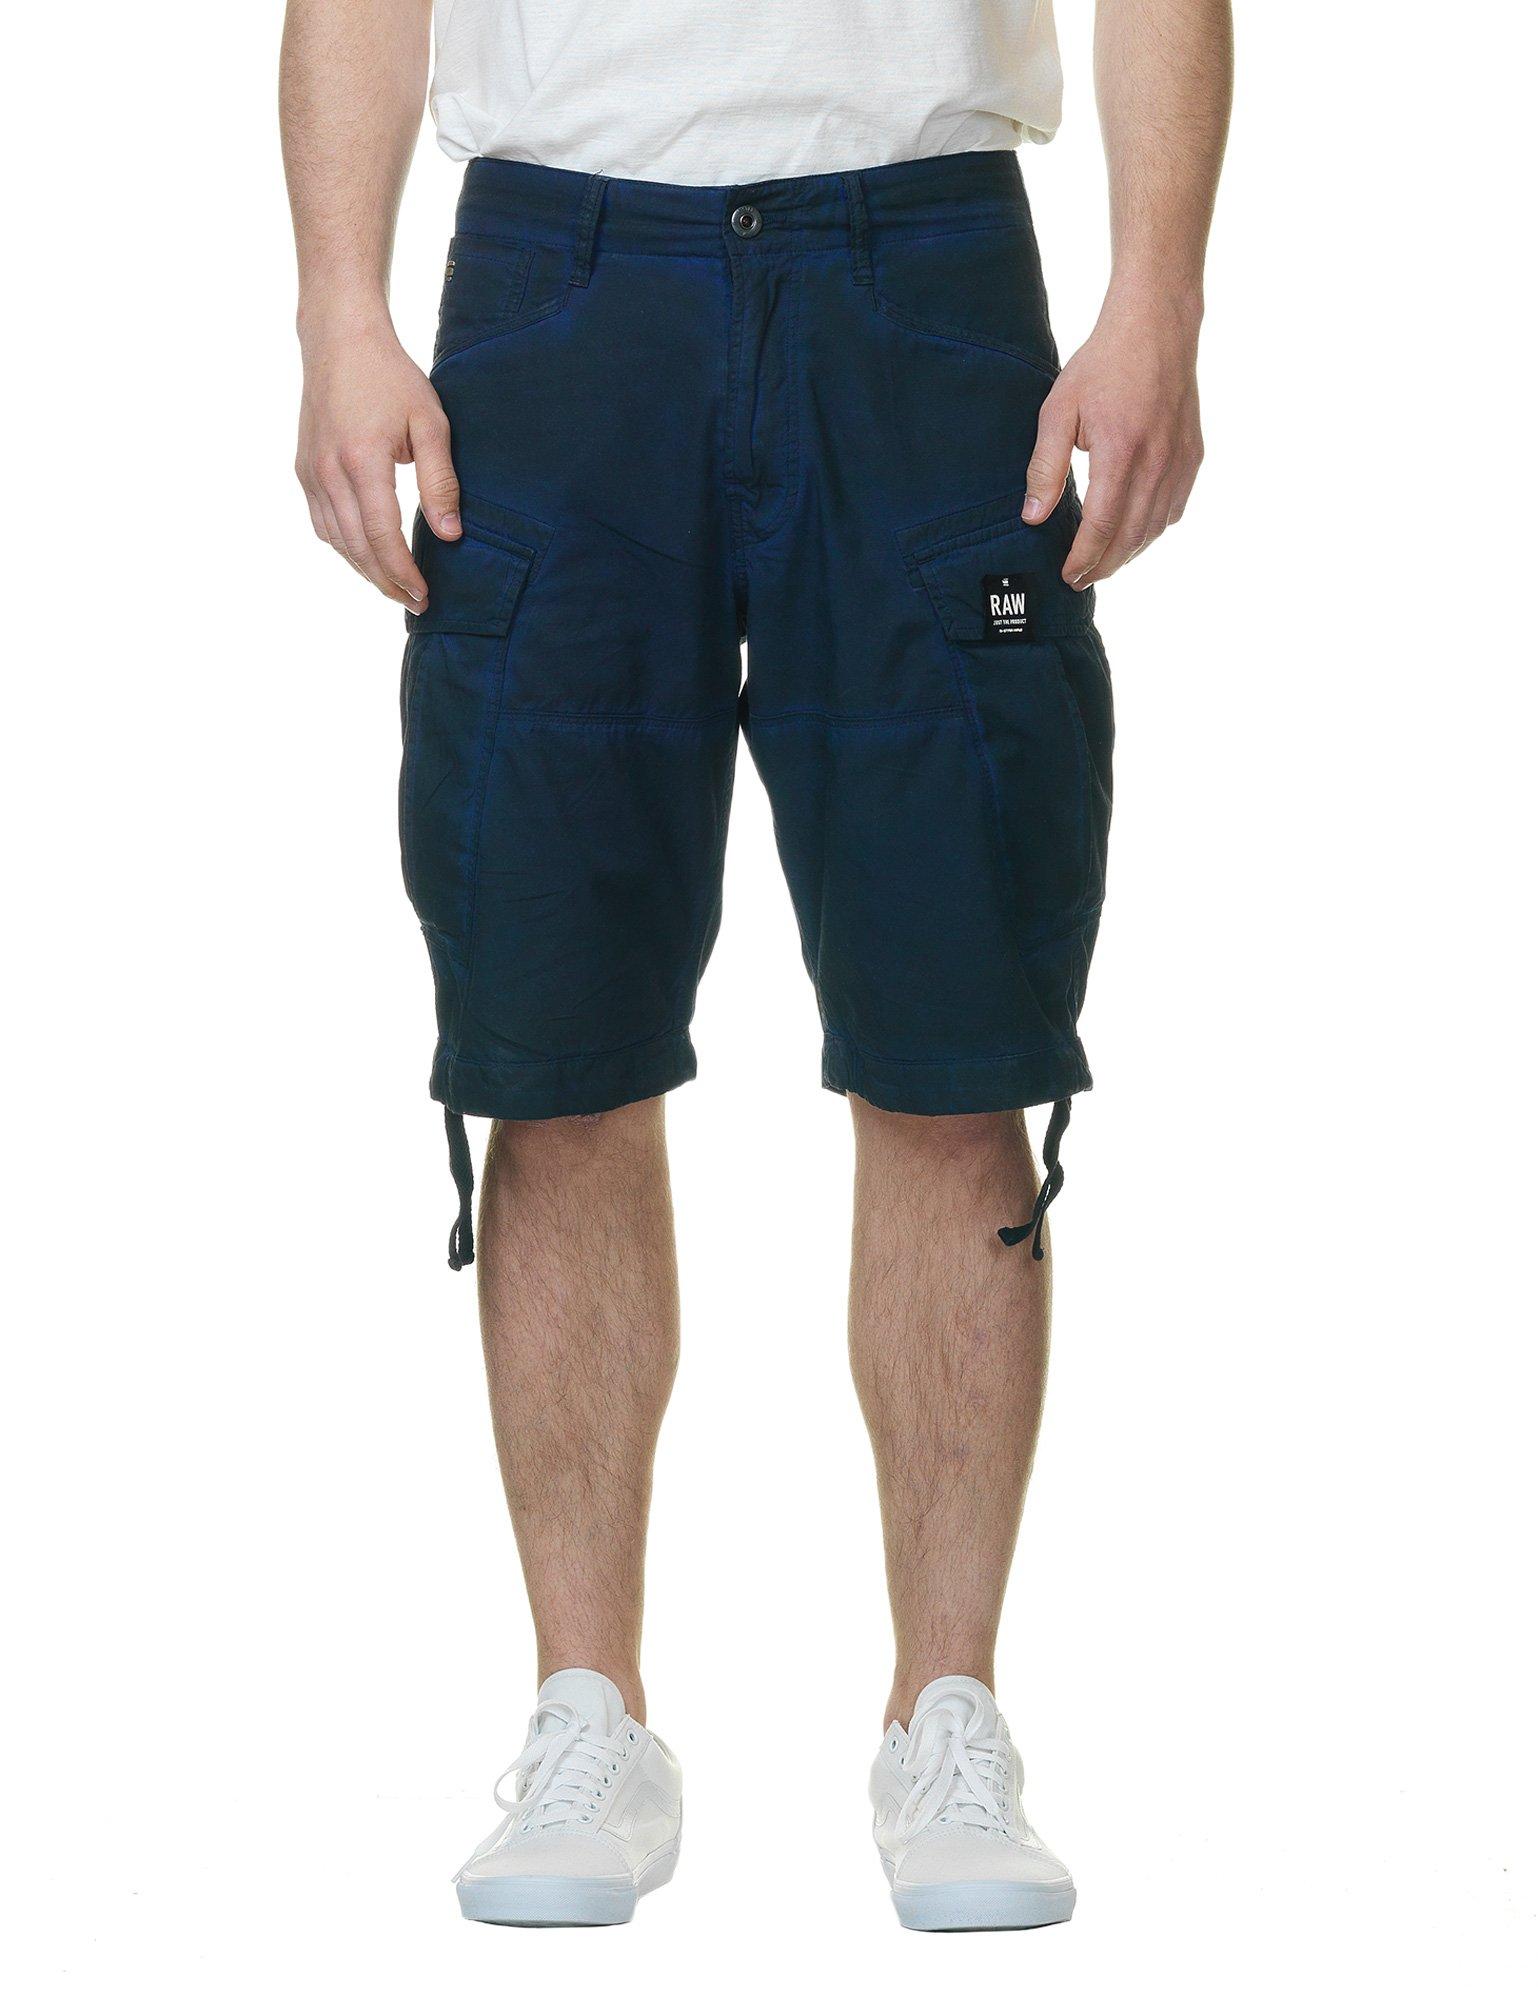 G-Star Raw Men's Rovic Loose 1/2 Shorts Hudson, Hudson Blue/Imperial Blue, 31